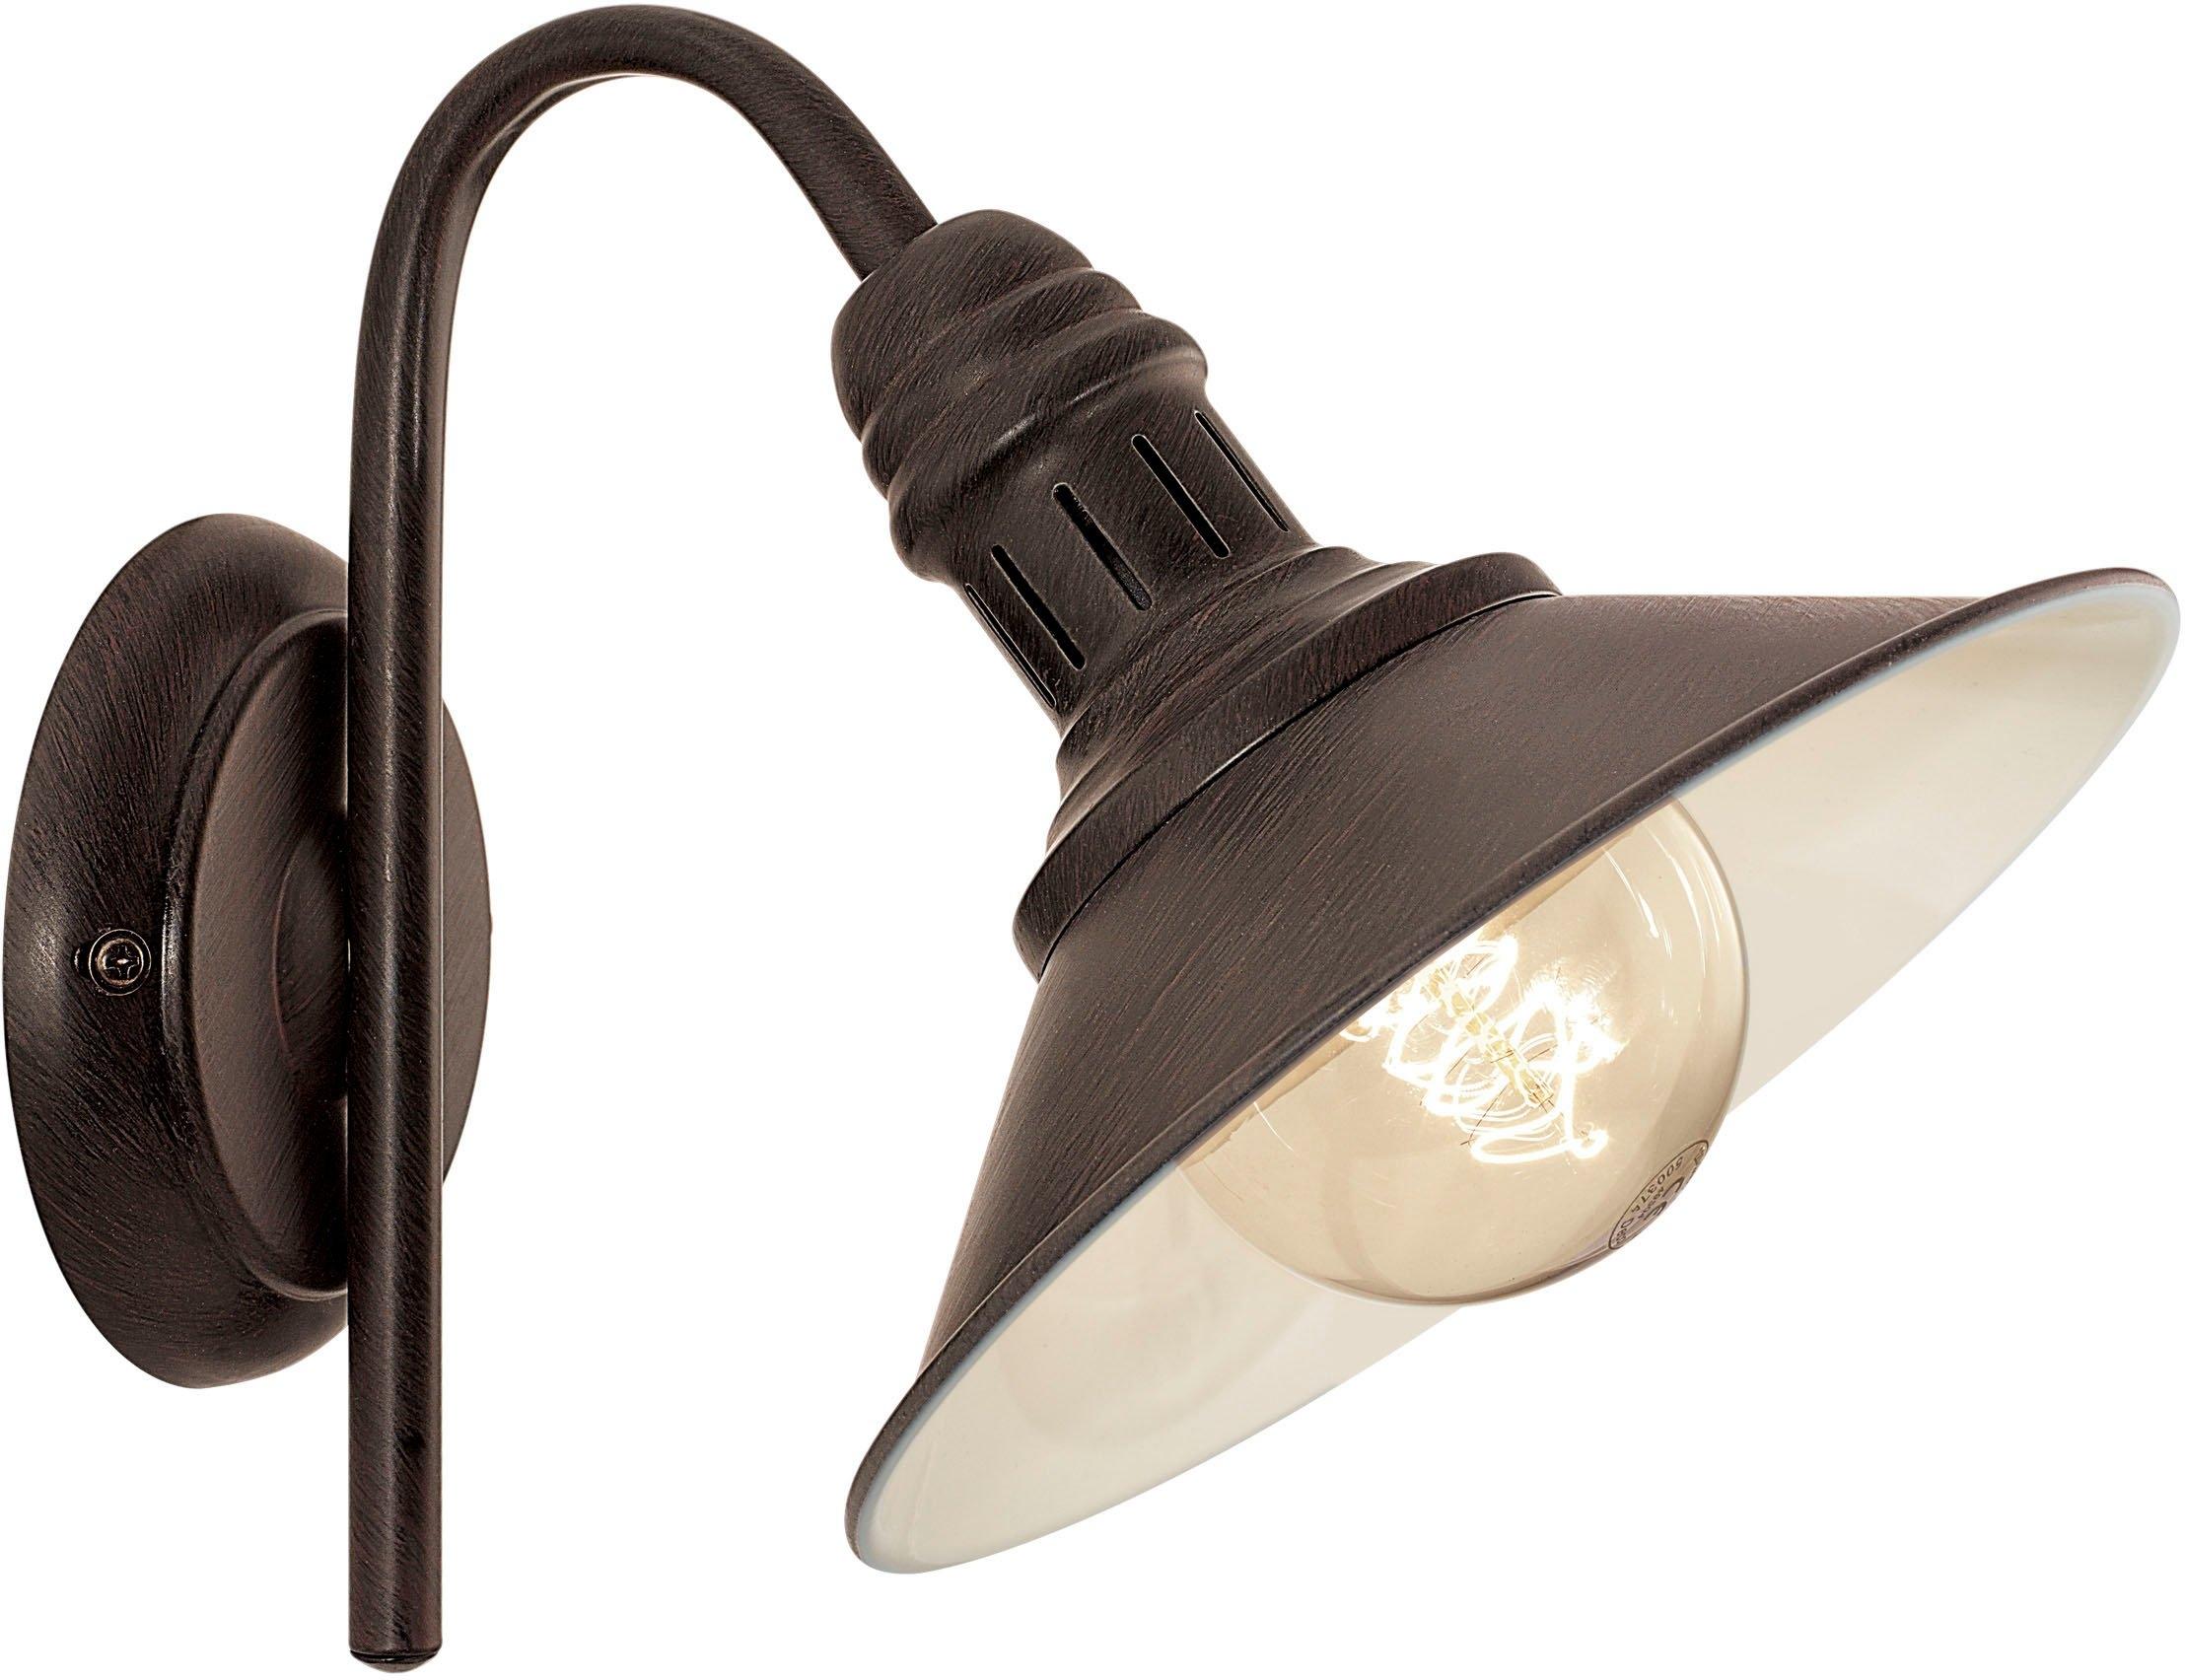 EGLO wandlamp STOCKBURY - verschillende betaalmethodes